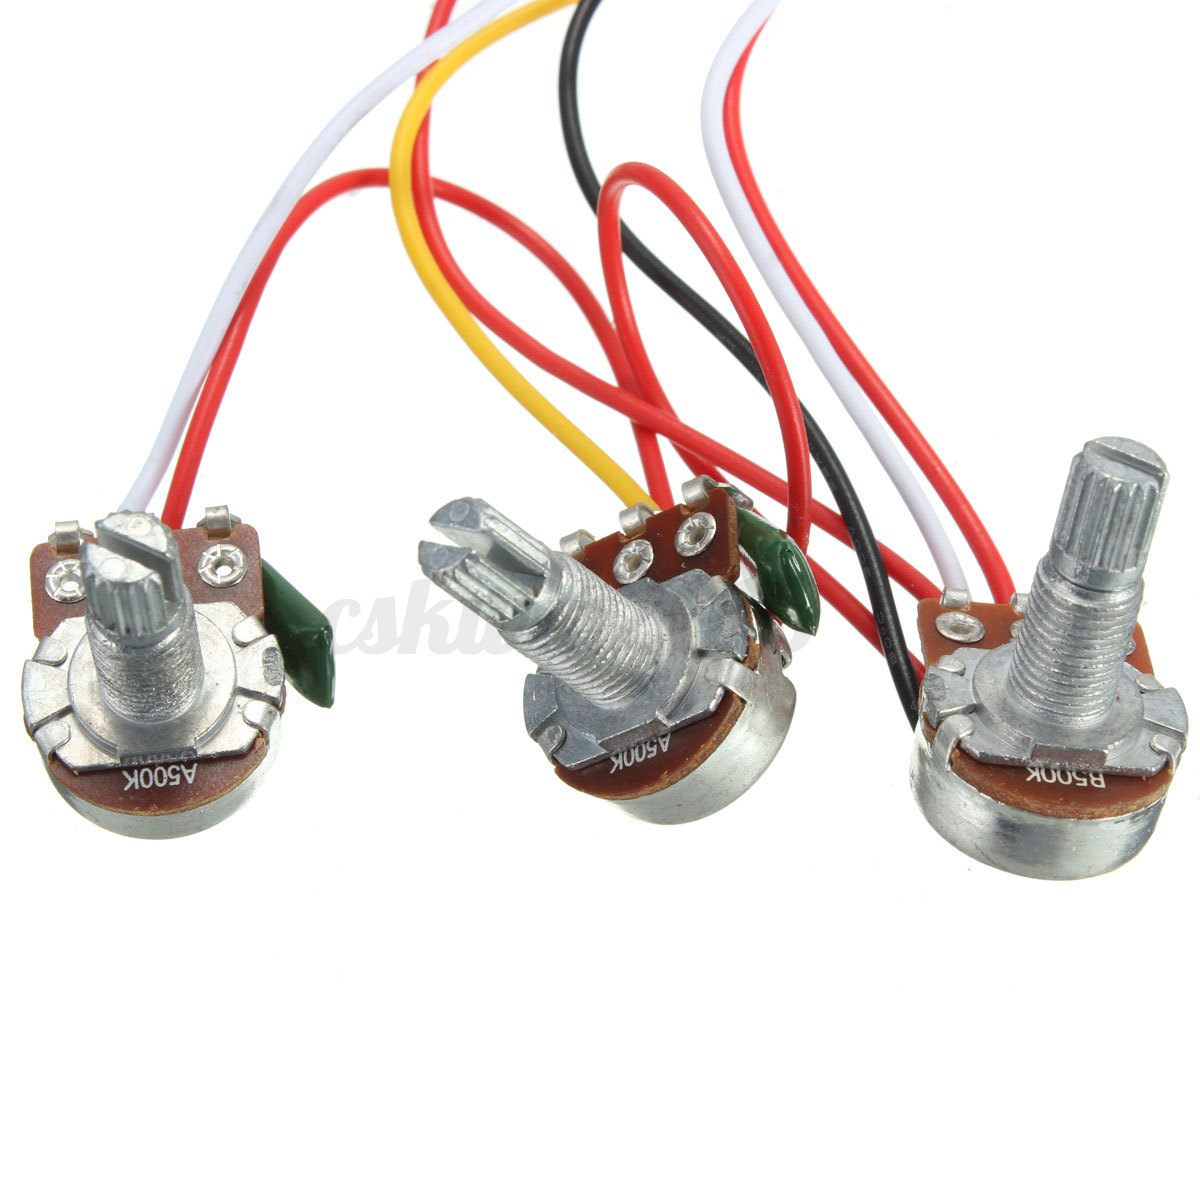 hight resolution of fender pots strat wiring diagram fender strat wiring diagram pots fender strat 5 way switch wiring